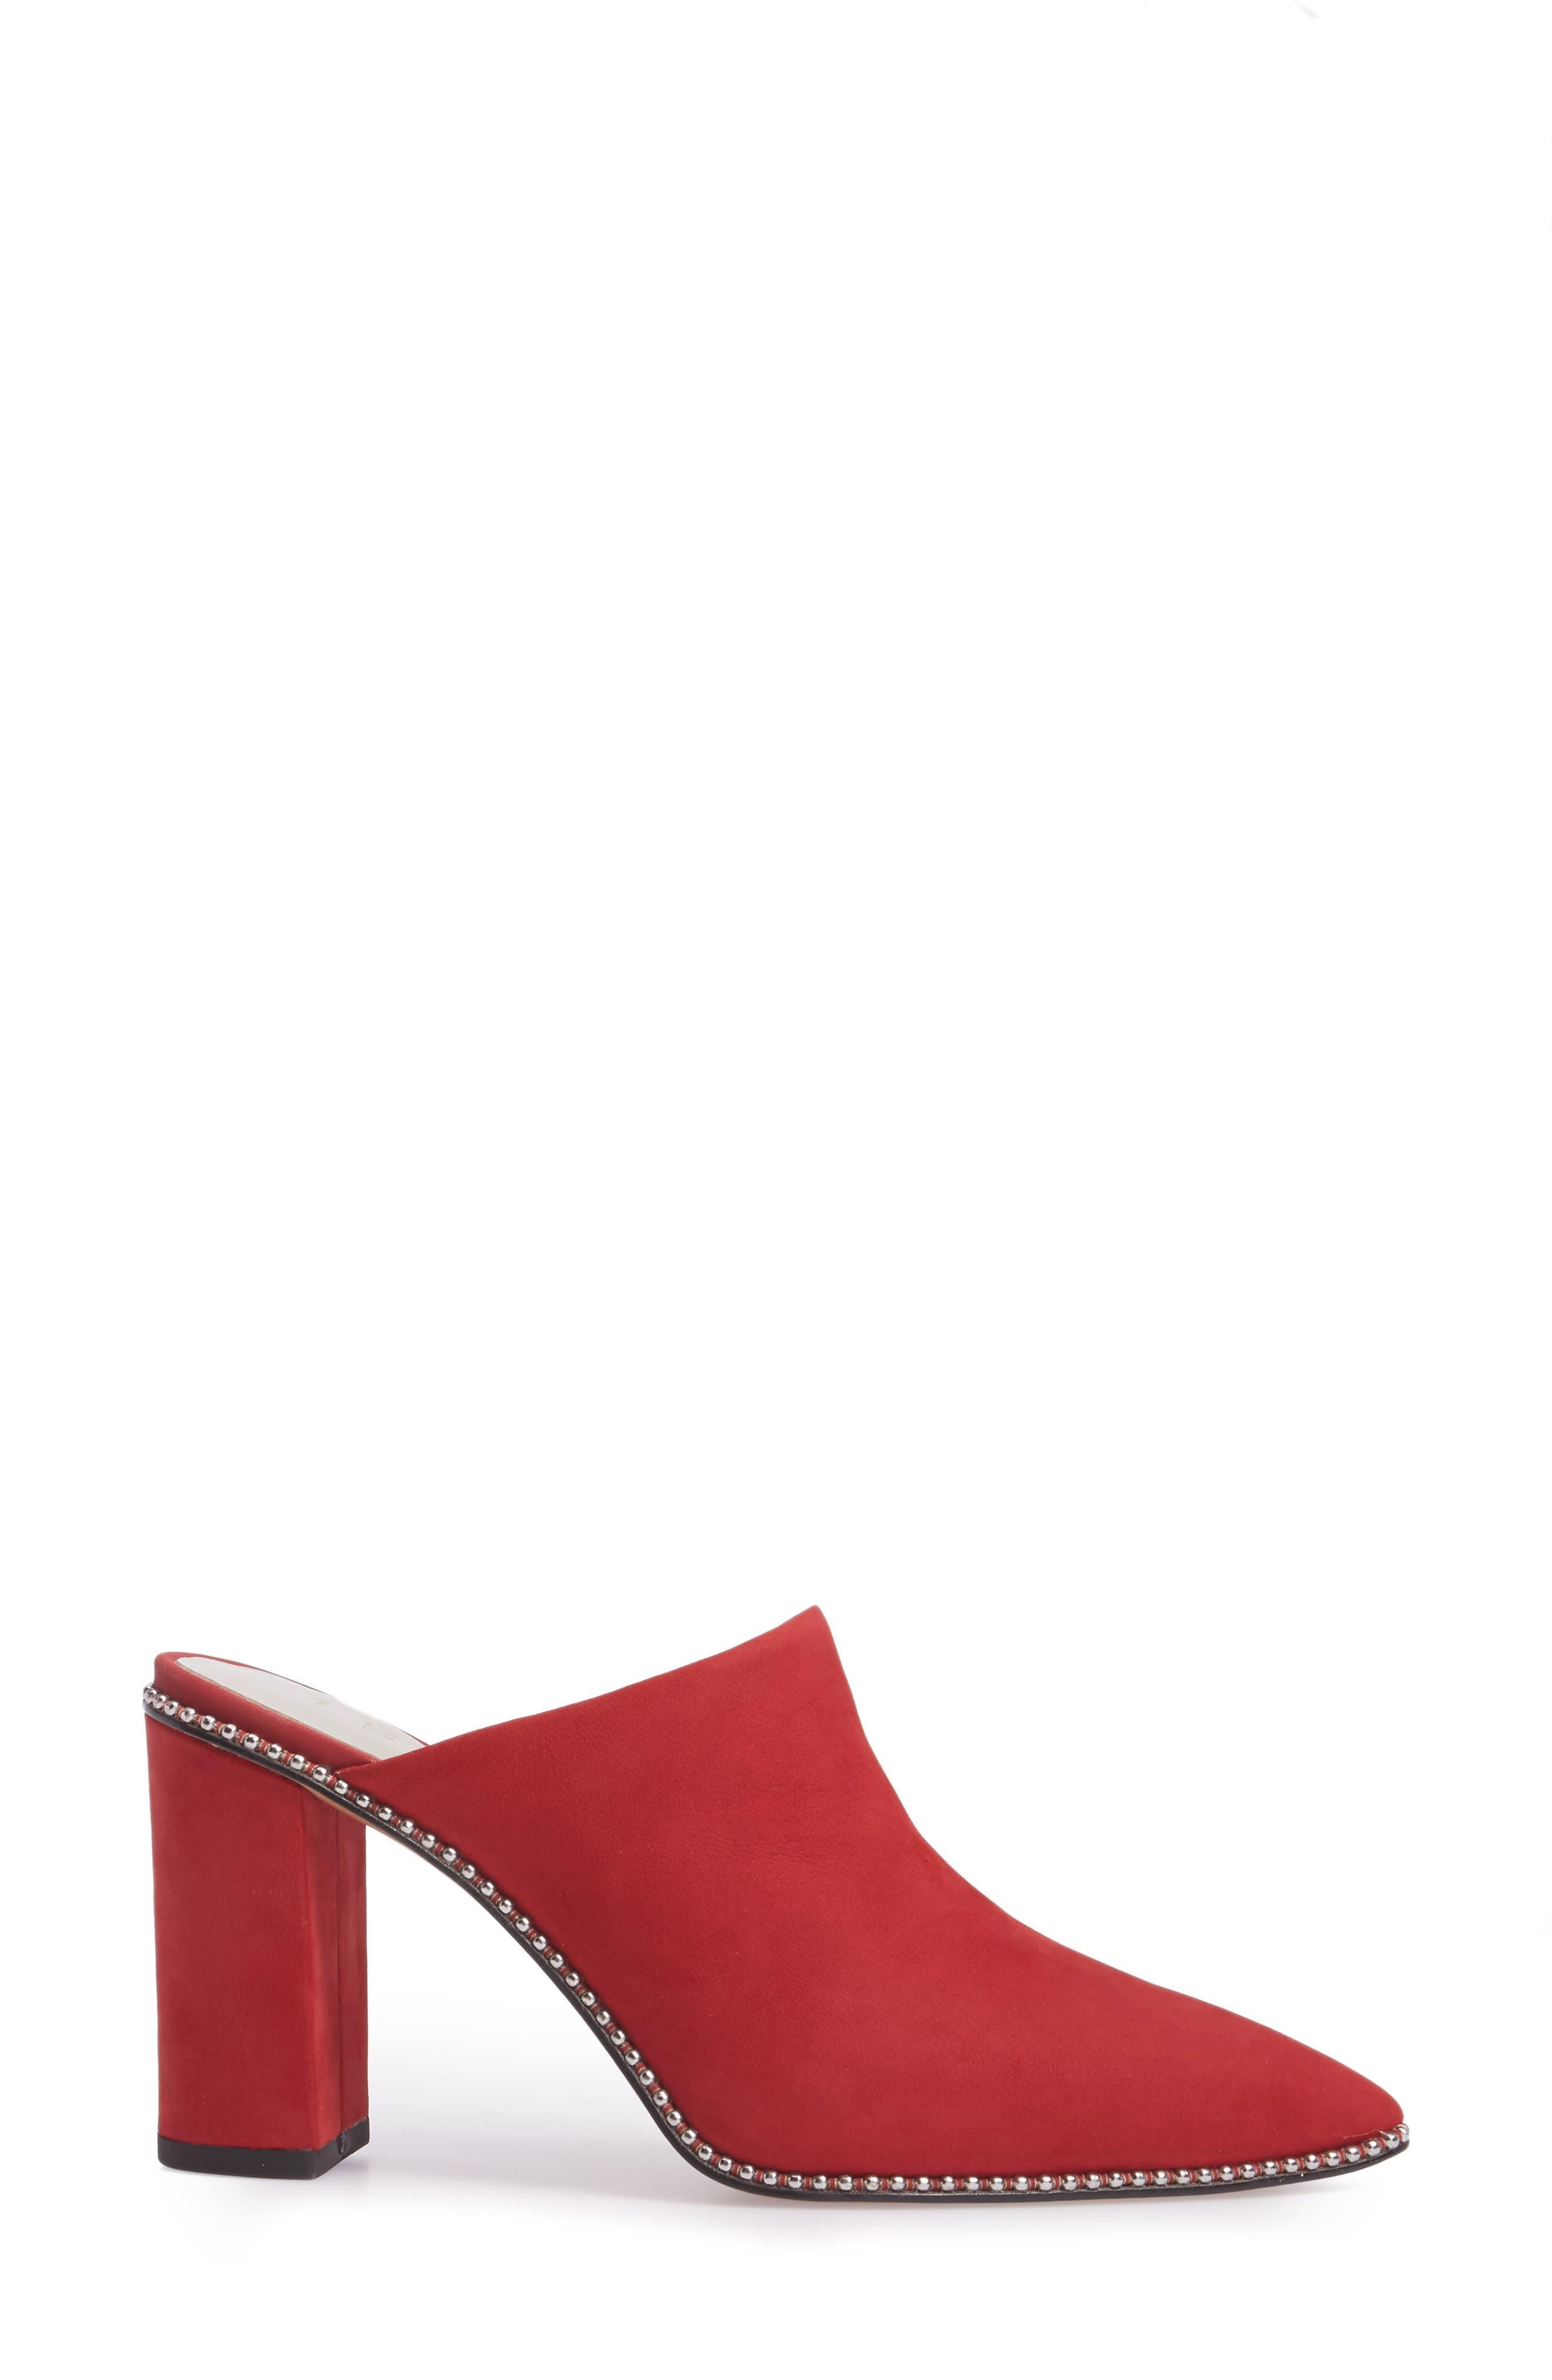 Relle Mule,                             Alternate thumbnail 3, color,                             Scarlet Leather